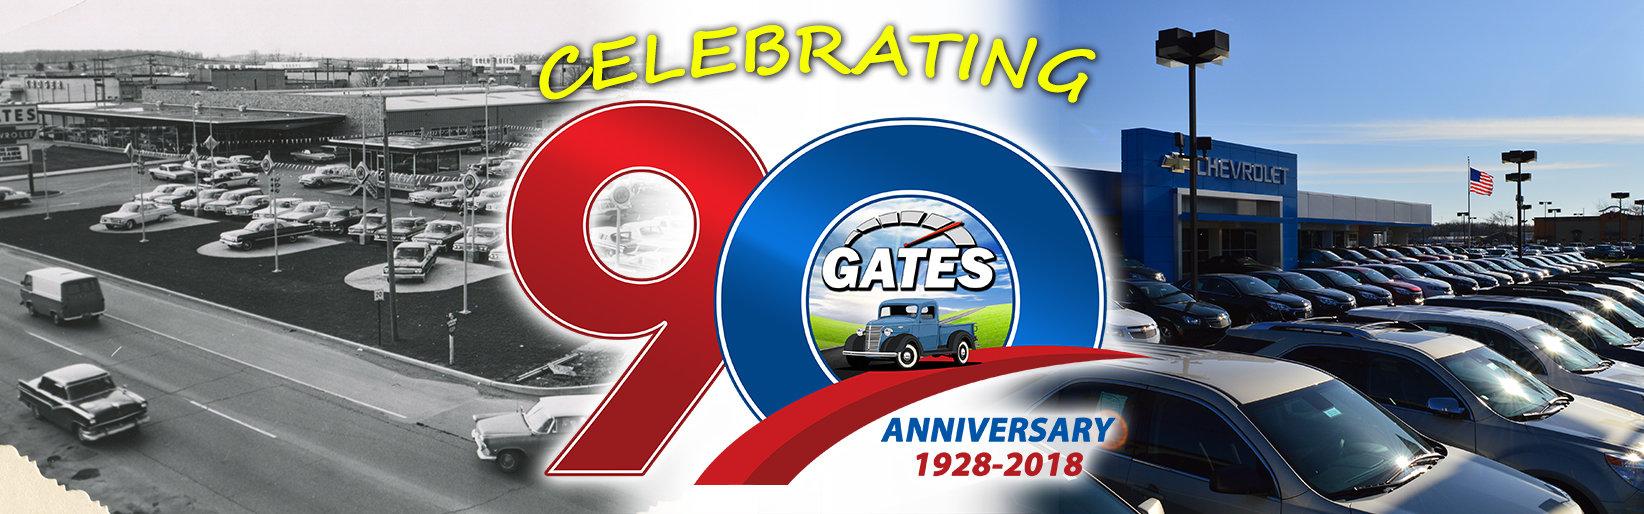 90th Anniversary